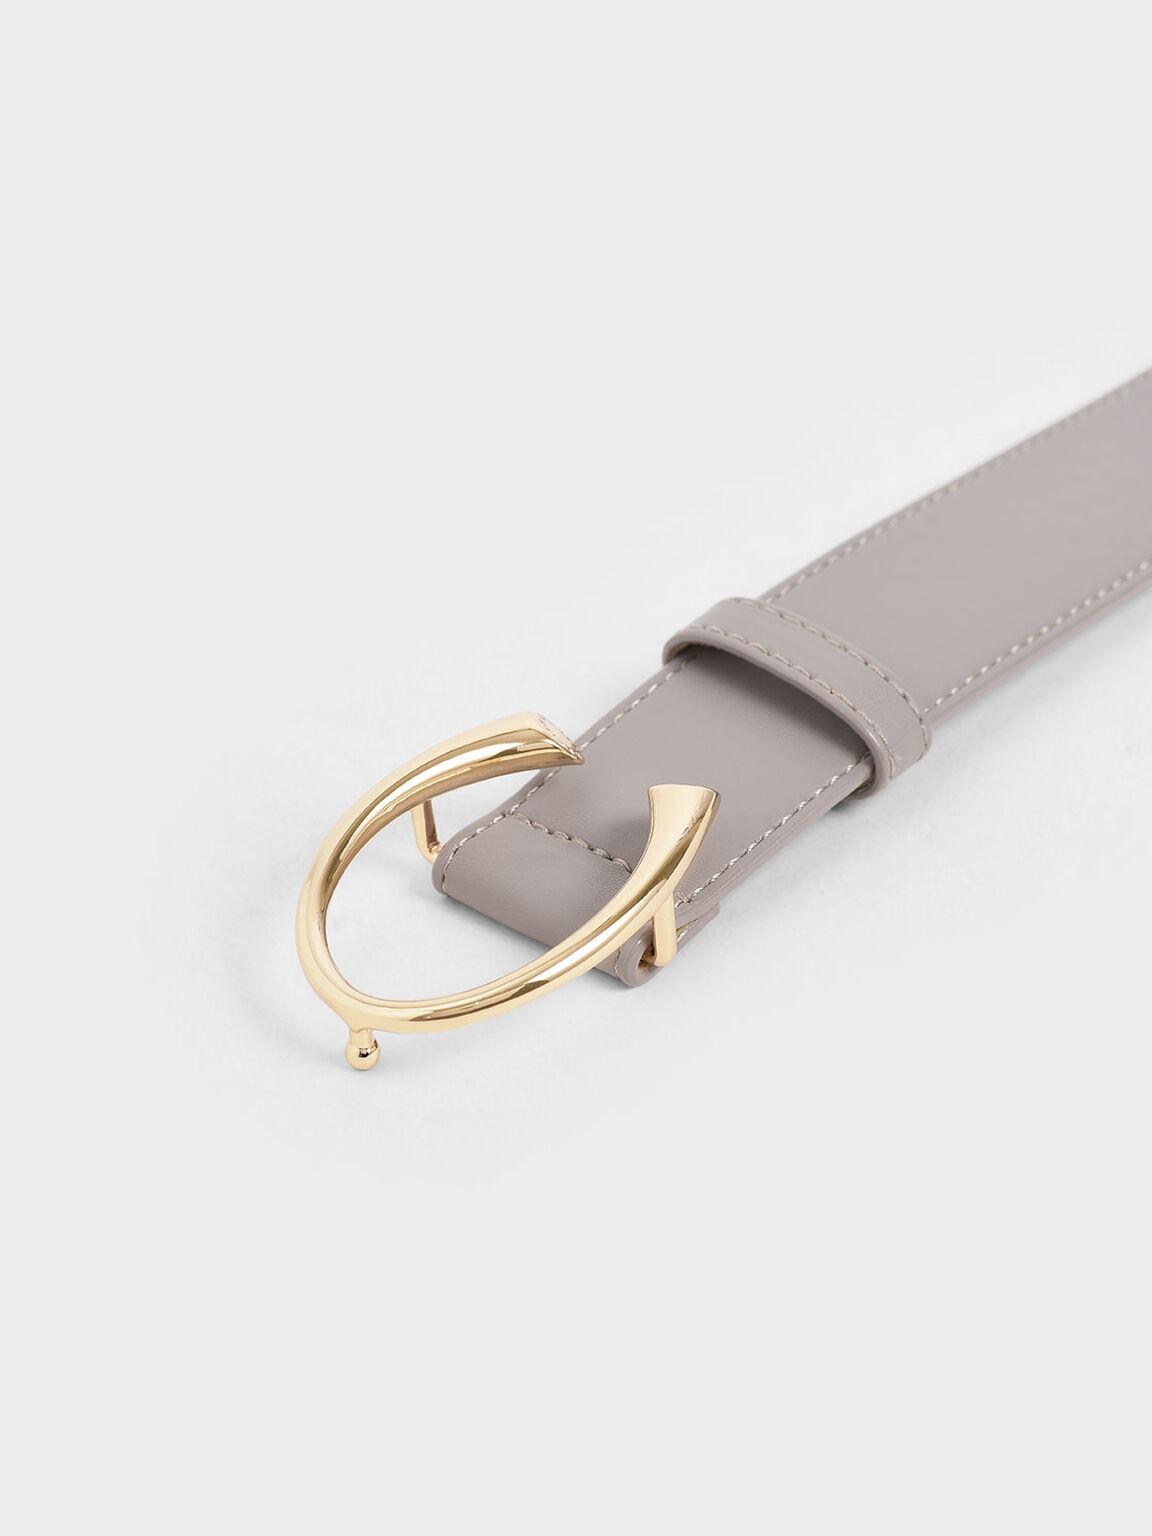 Metal Buckle Low Waist Belt, Sand, hi-res